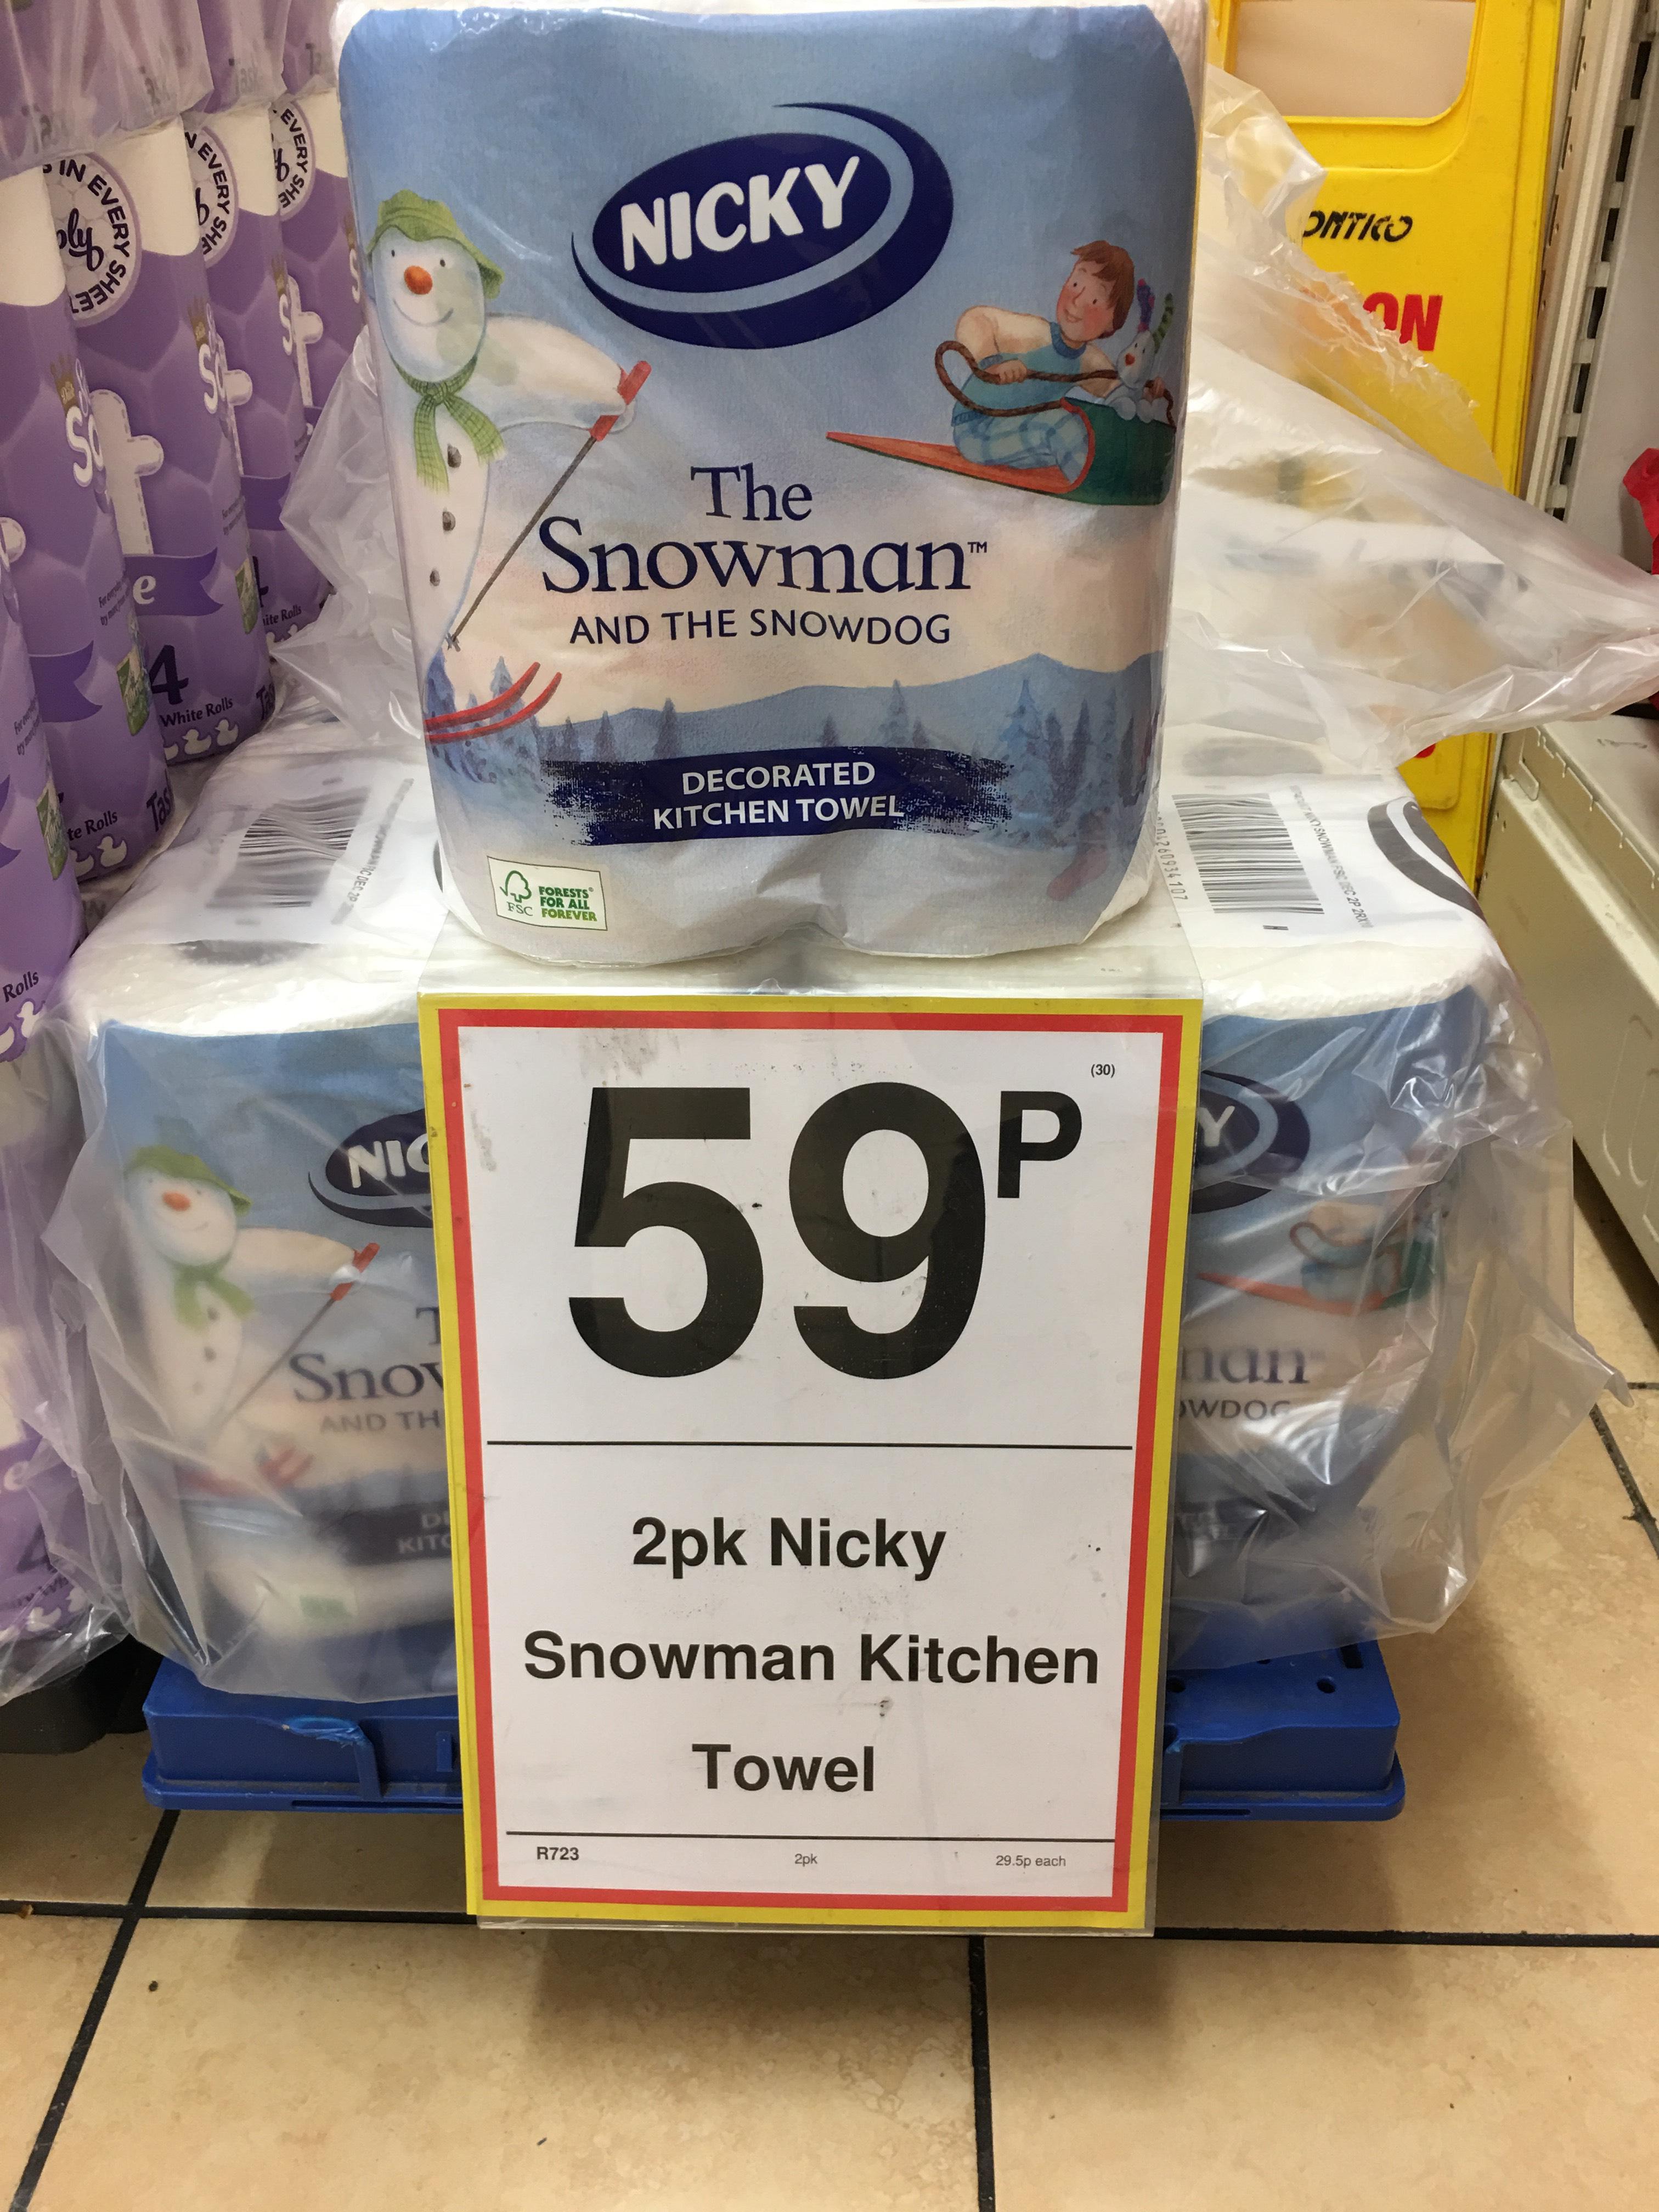 2pk Nicky snowman kitchen towel 59p Farmfoods Sutton